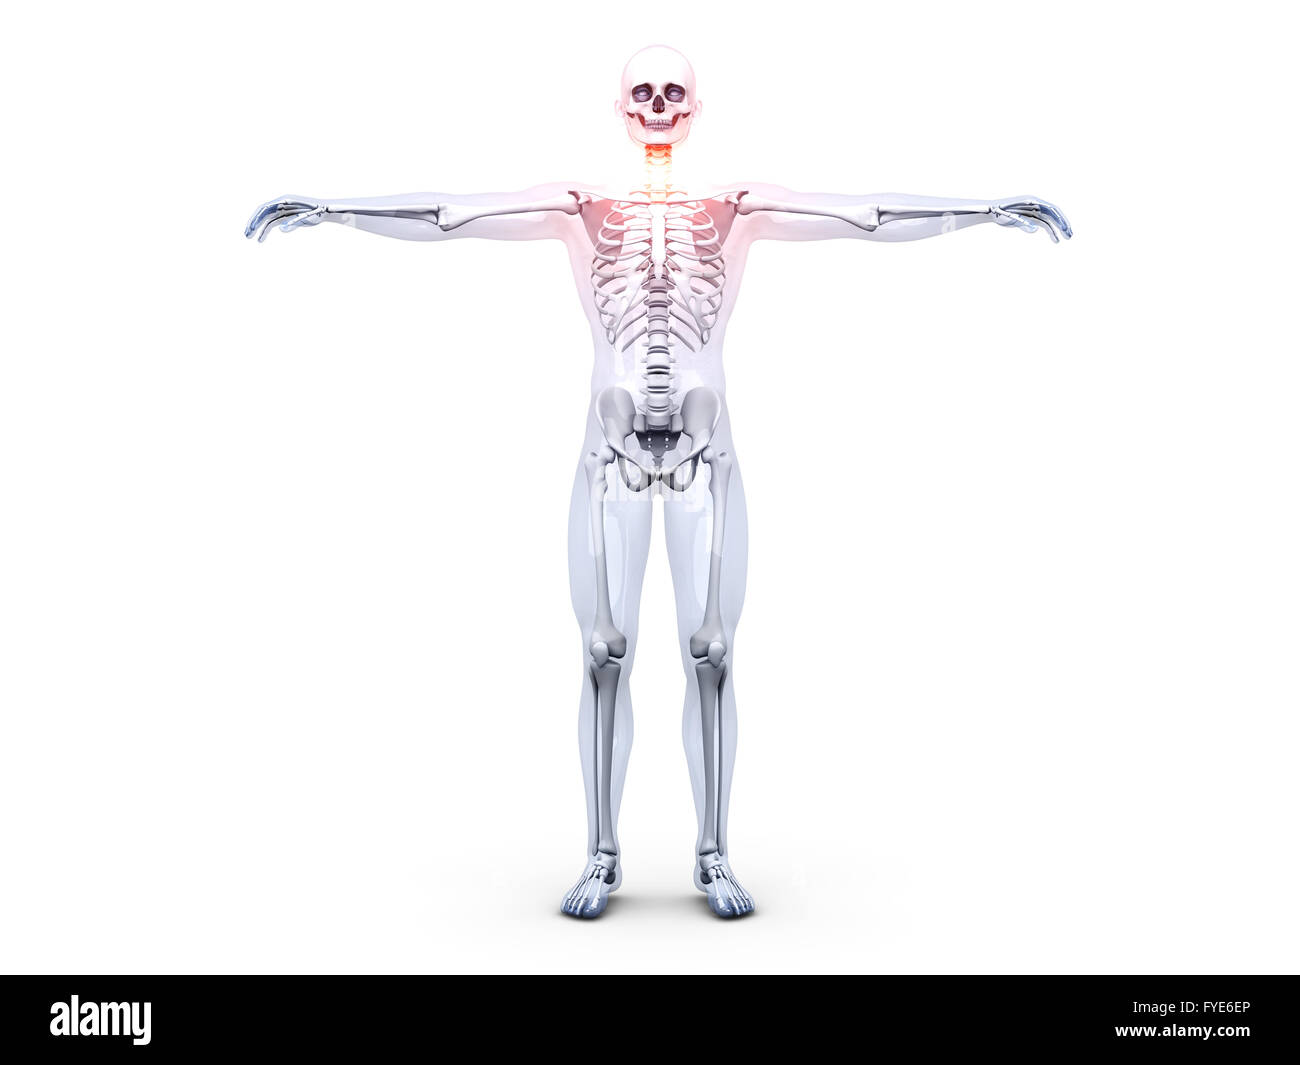 Sore Throat - Anatomy Stock Photo: 102959998 - Alamy